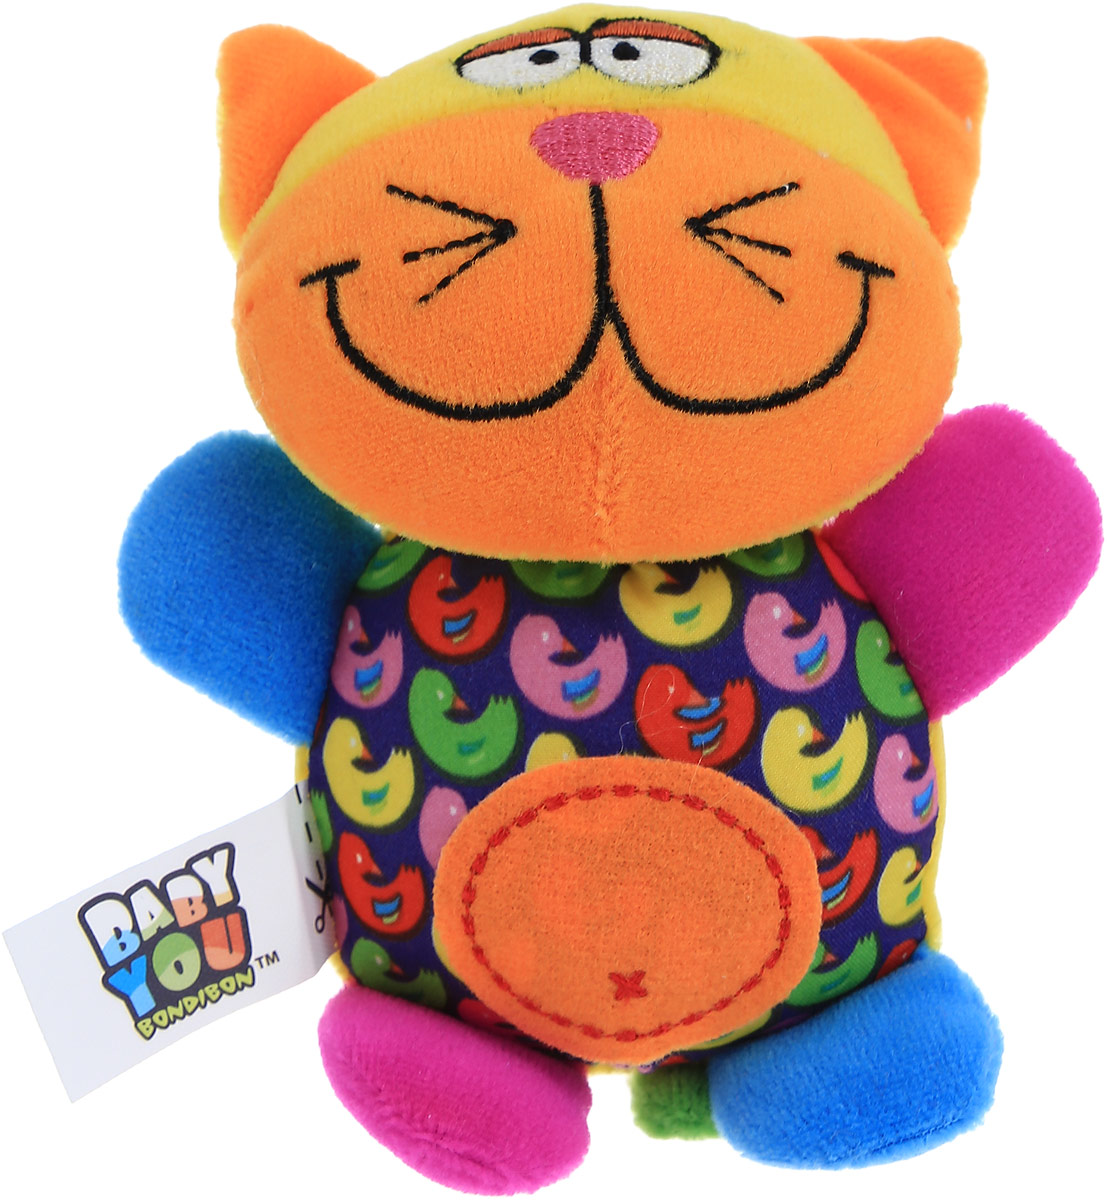 Bondibon Мягкая игрушка-погремушка Котик bondibon мягкая игрушка погремушка слоник